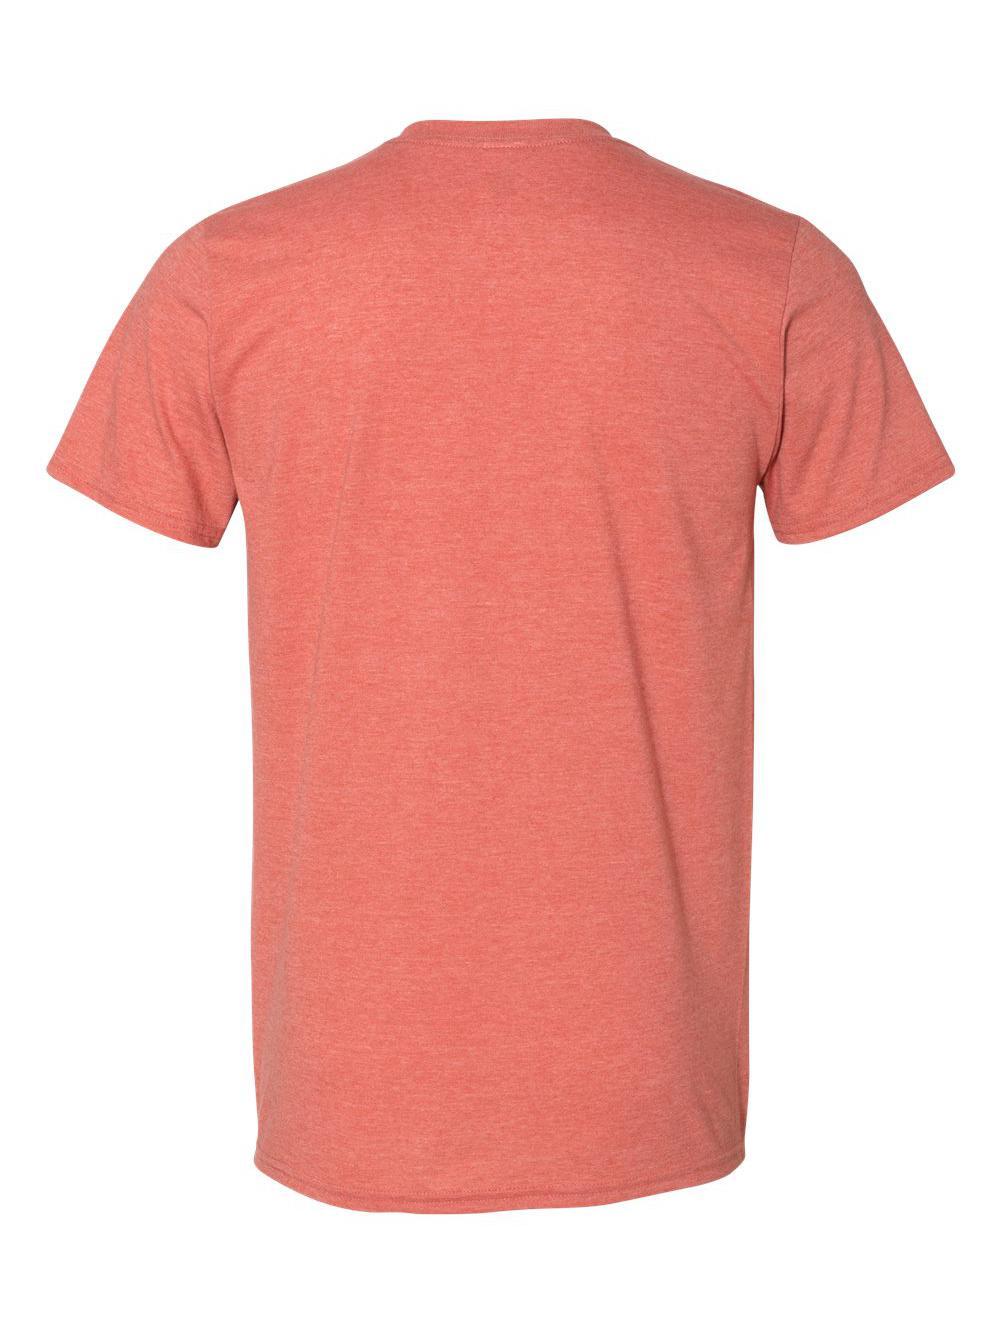 Gildan-Softstyle-T-Shirt-64000 thumbnail 58